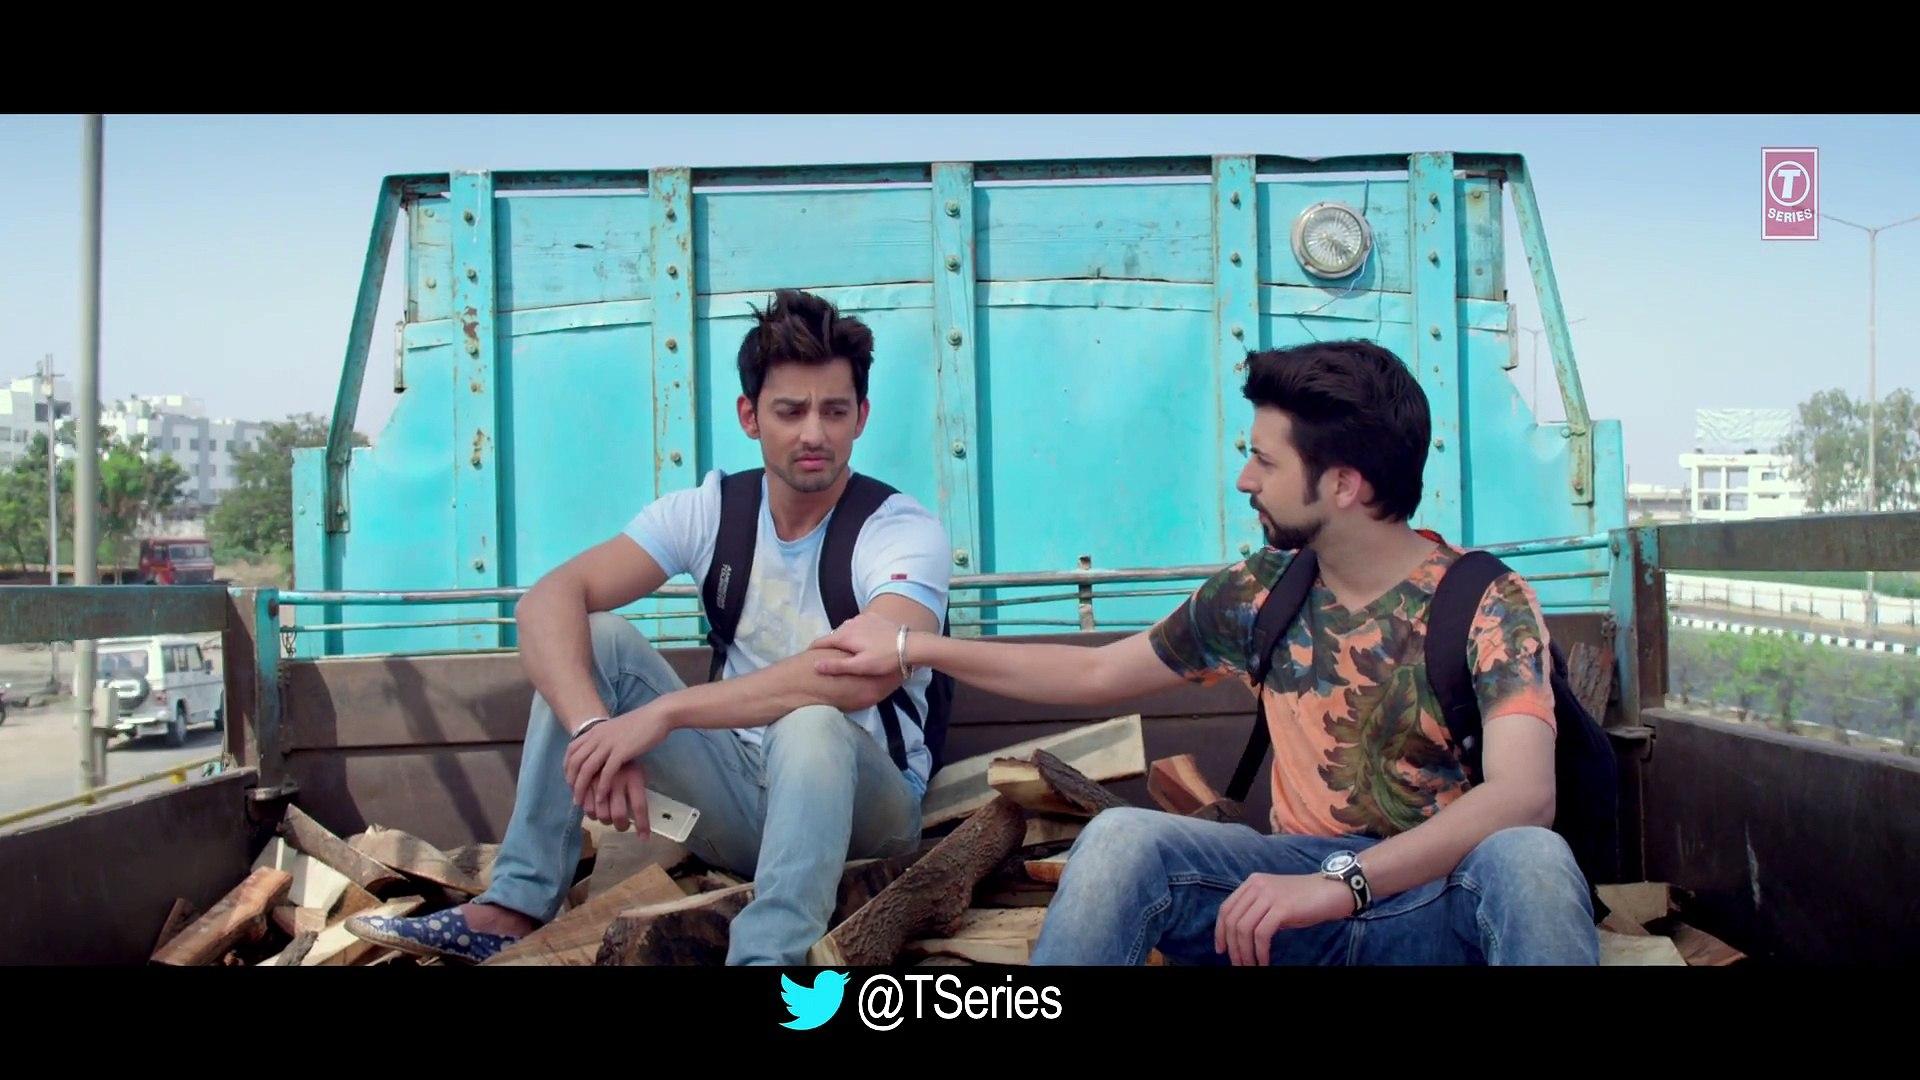 Musafir Hindi Video Song - Sweetiee Weds NRI (2017) | Himansh Kohli, Zoya Afroz | Palash Muchhal | A